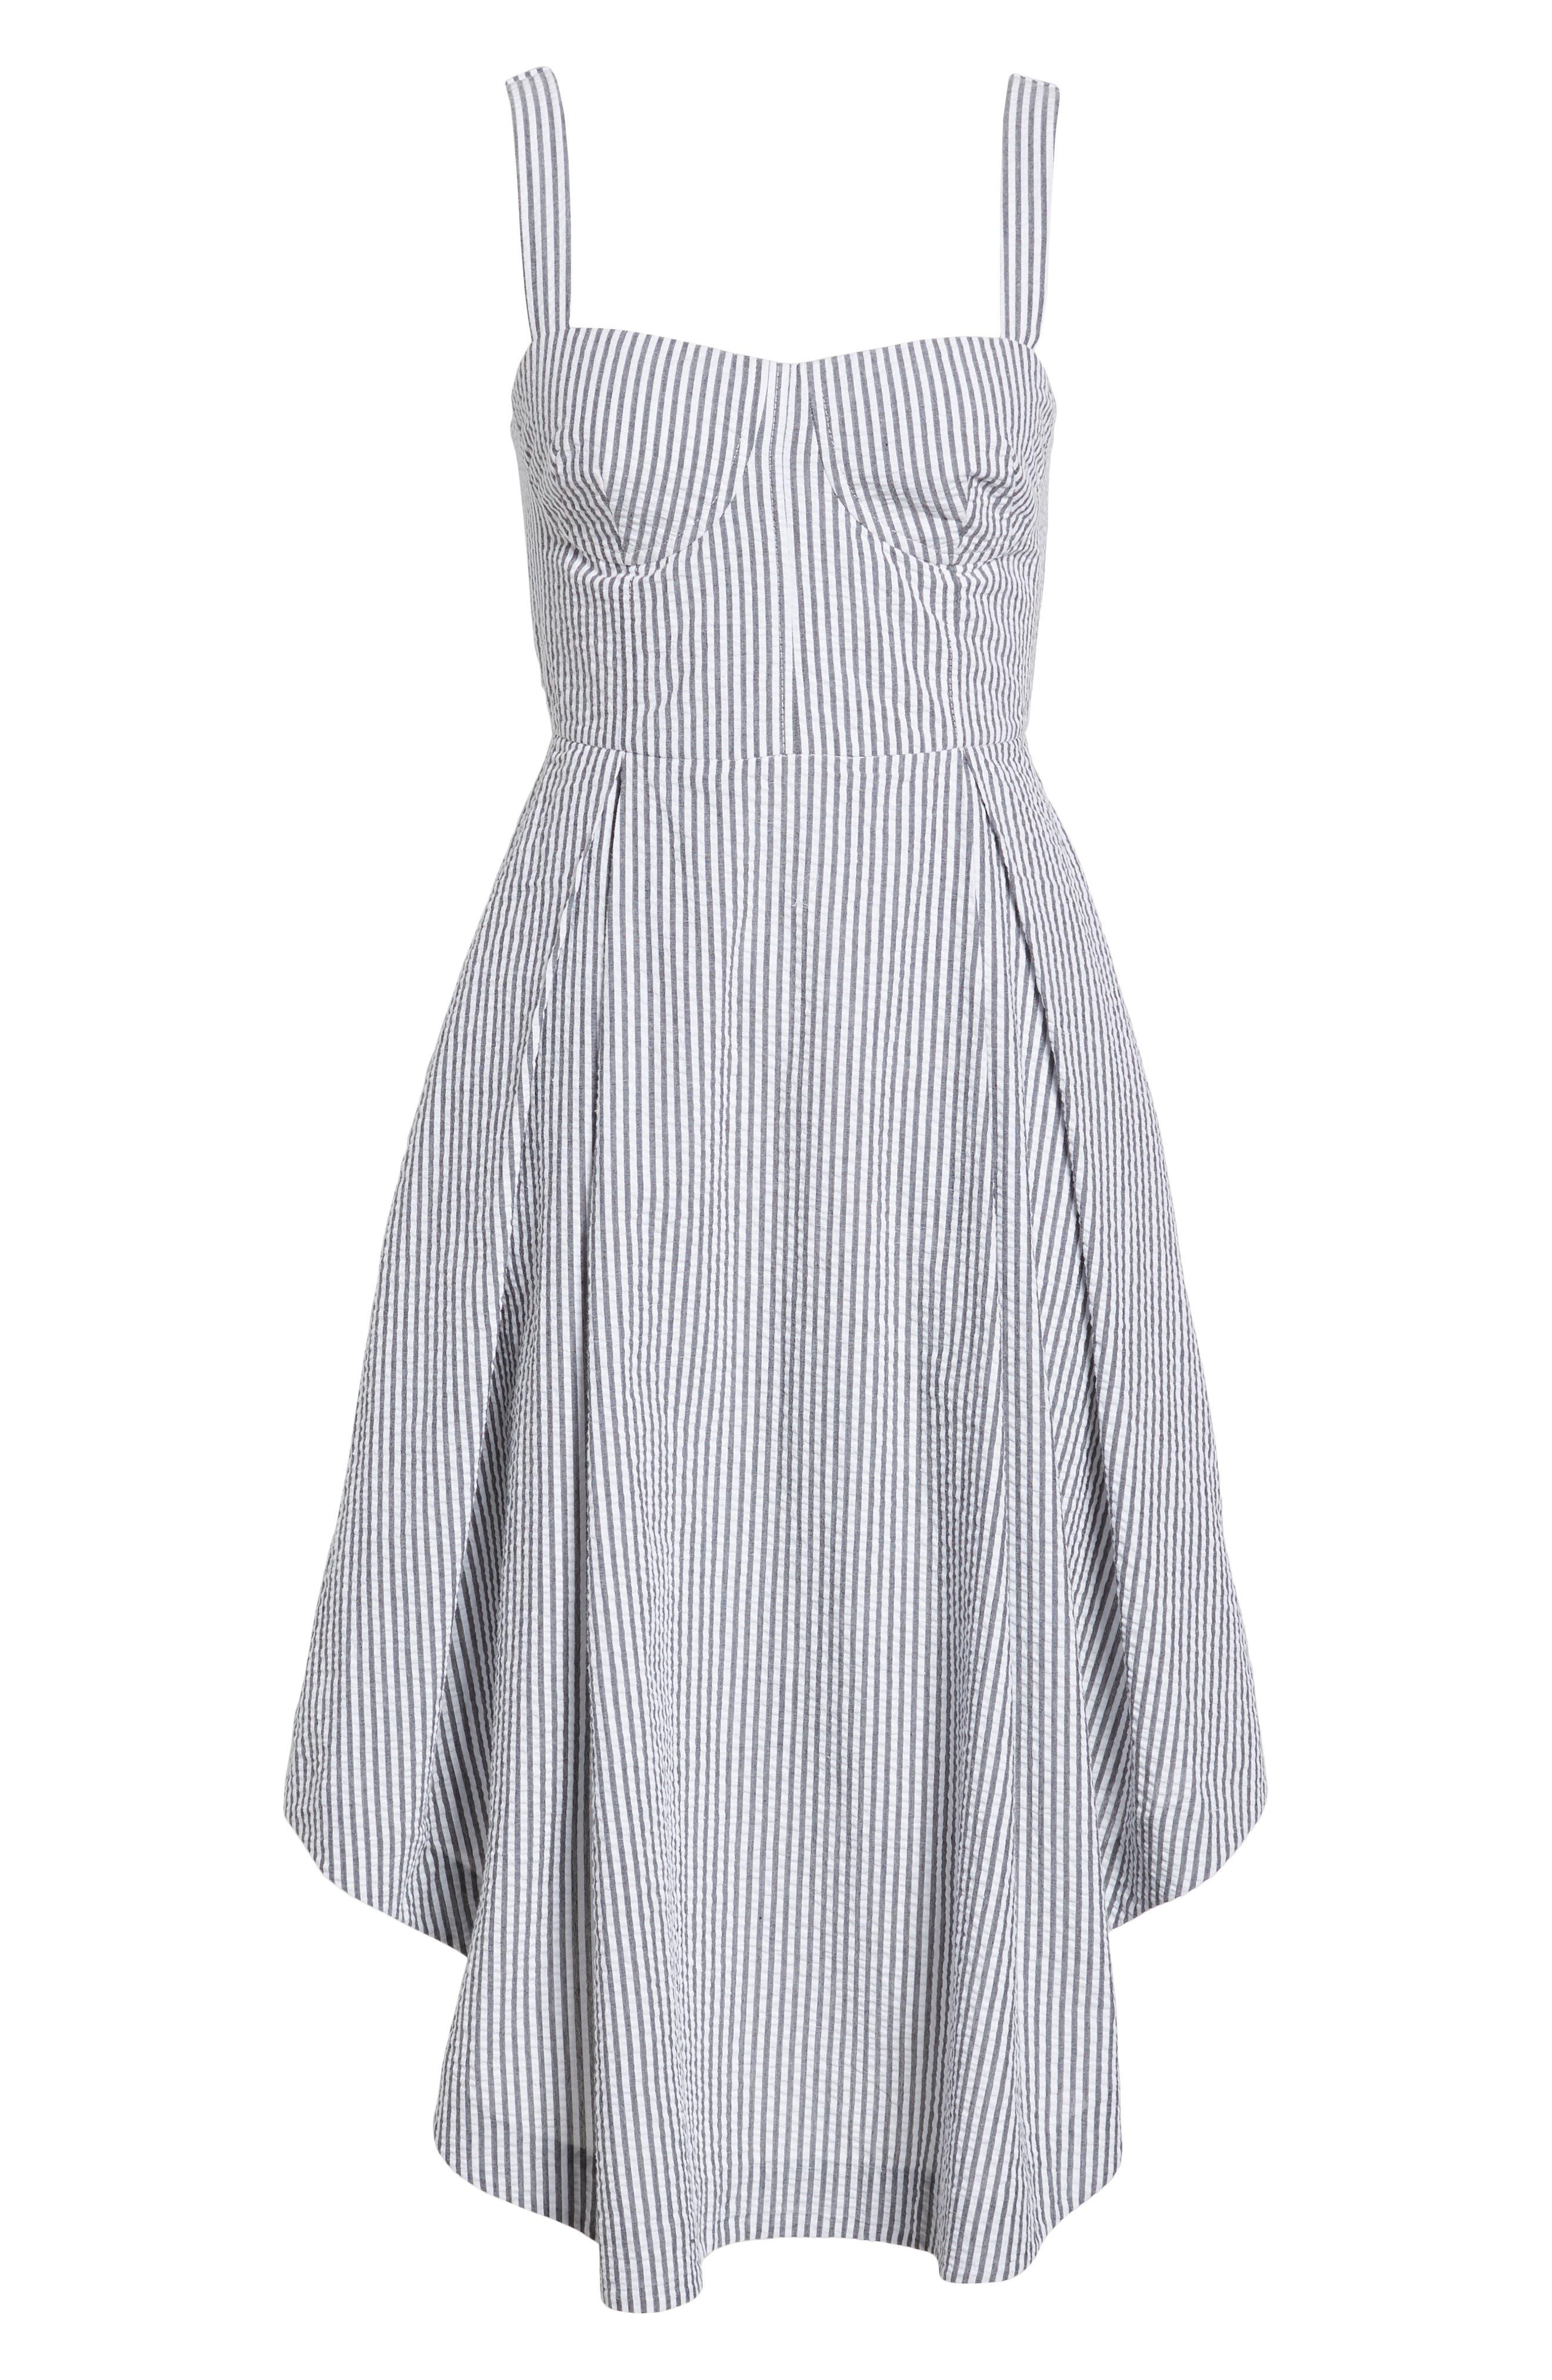 Seersucker Bustier Midi Dress,                             Alternate thumbnail 7, color,                             002